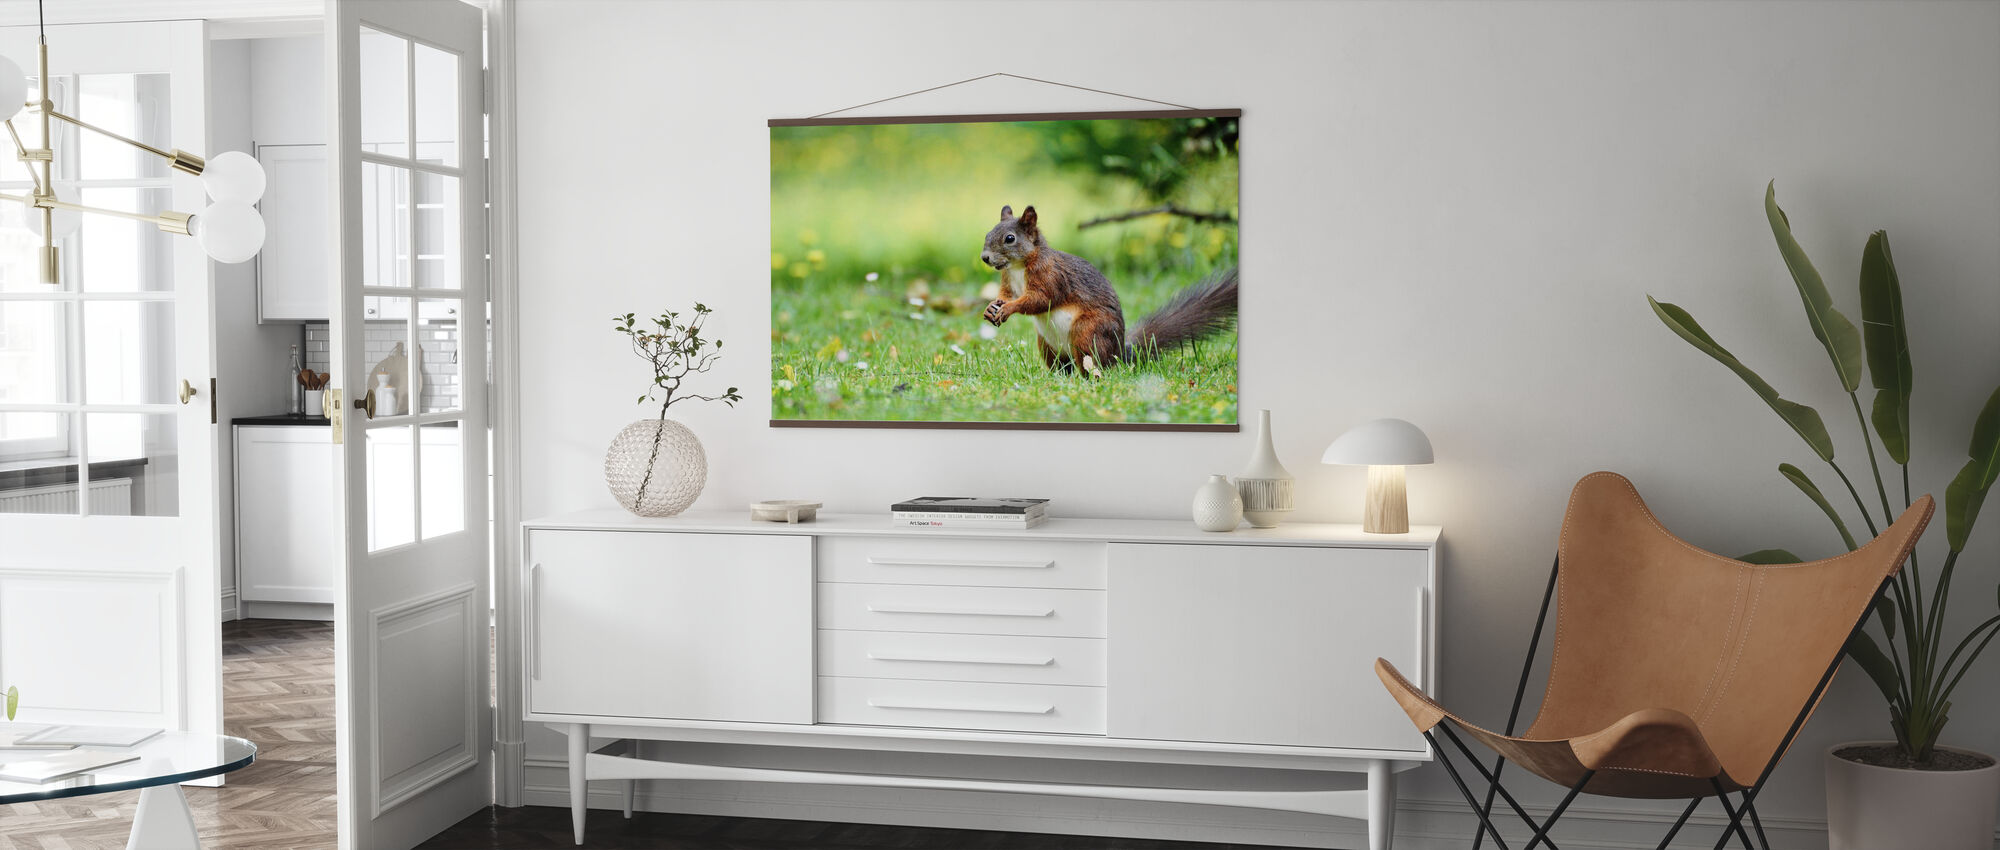 Oravien väestönlaskenta - Juliste - Olohuone